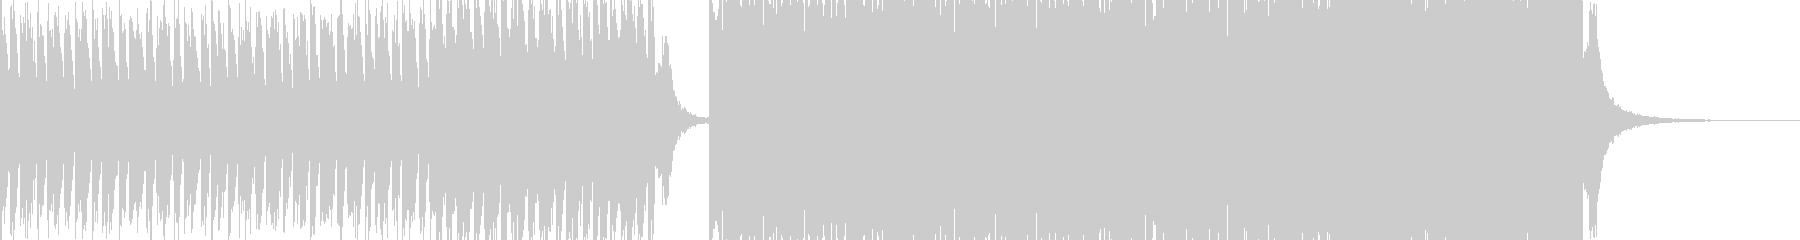 【EDM】ビッグフロア系、迫力なナンバーの未再生の波形